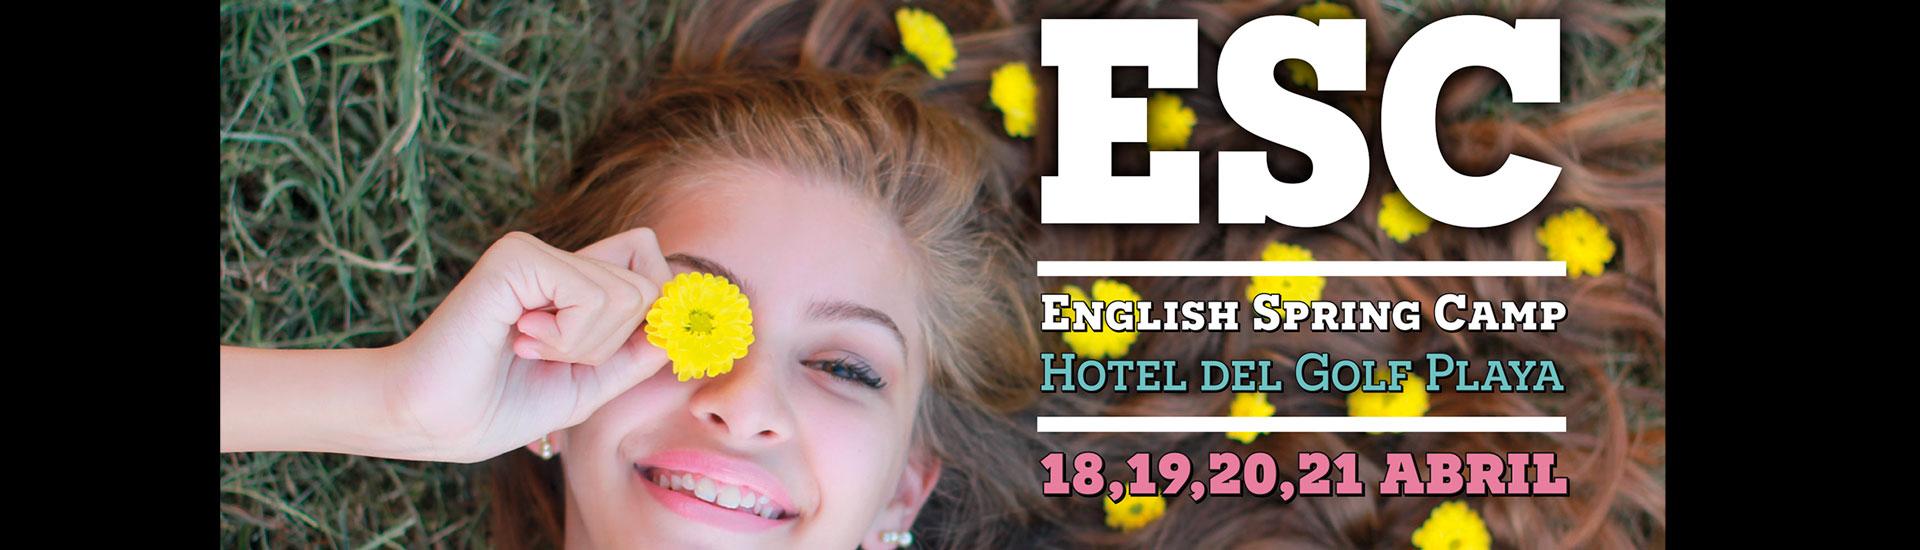 Campamento ingles – English Spring Camp – Hotel del Golf Playa